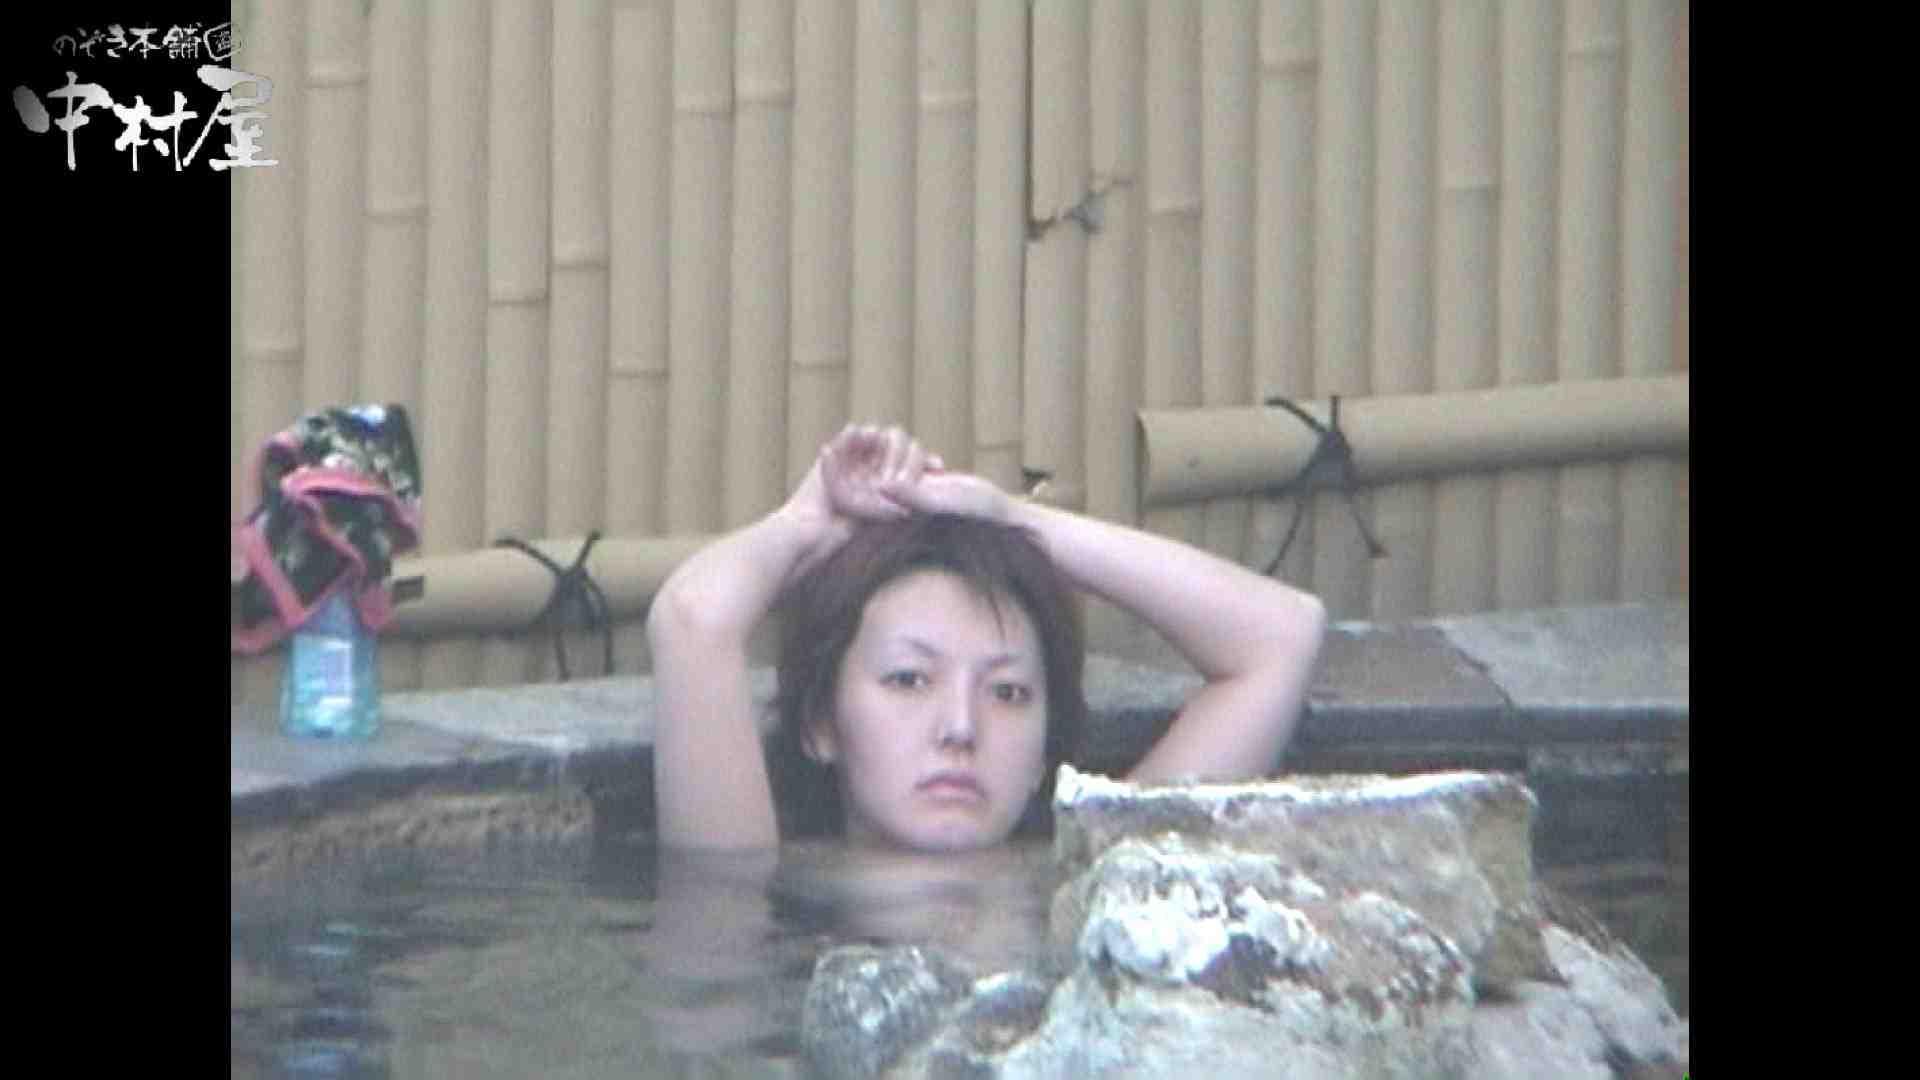 Aquaな露天風呂Vol.959 盗撮シリーズ | 露天風呂編  80PIX 3